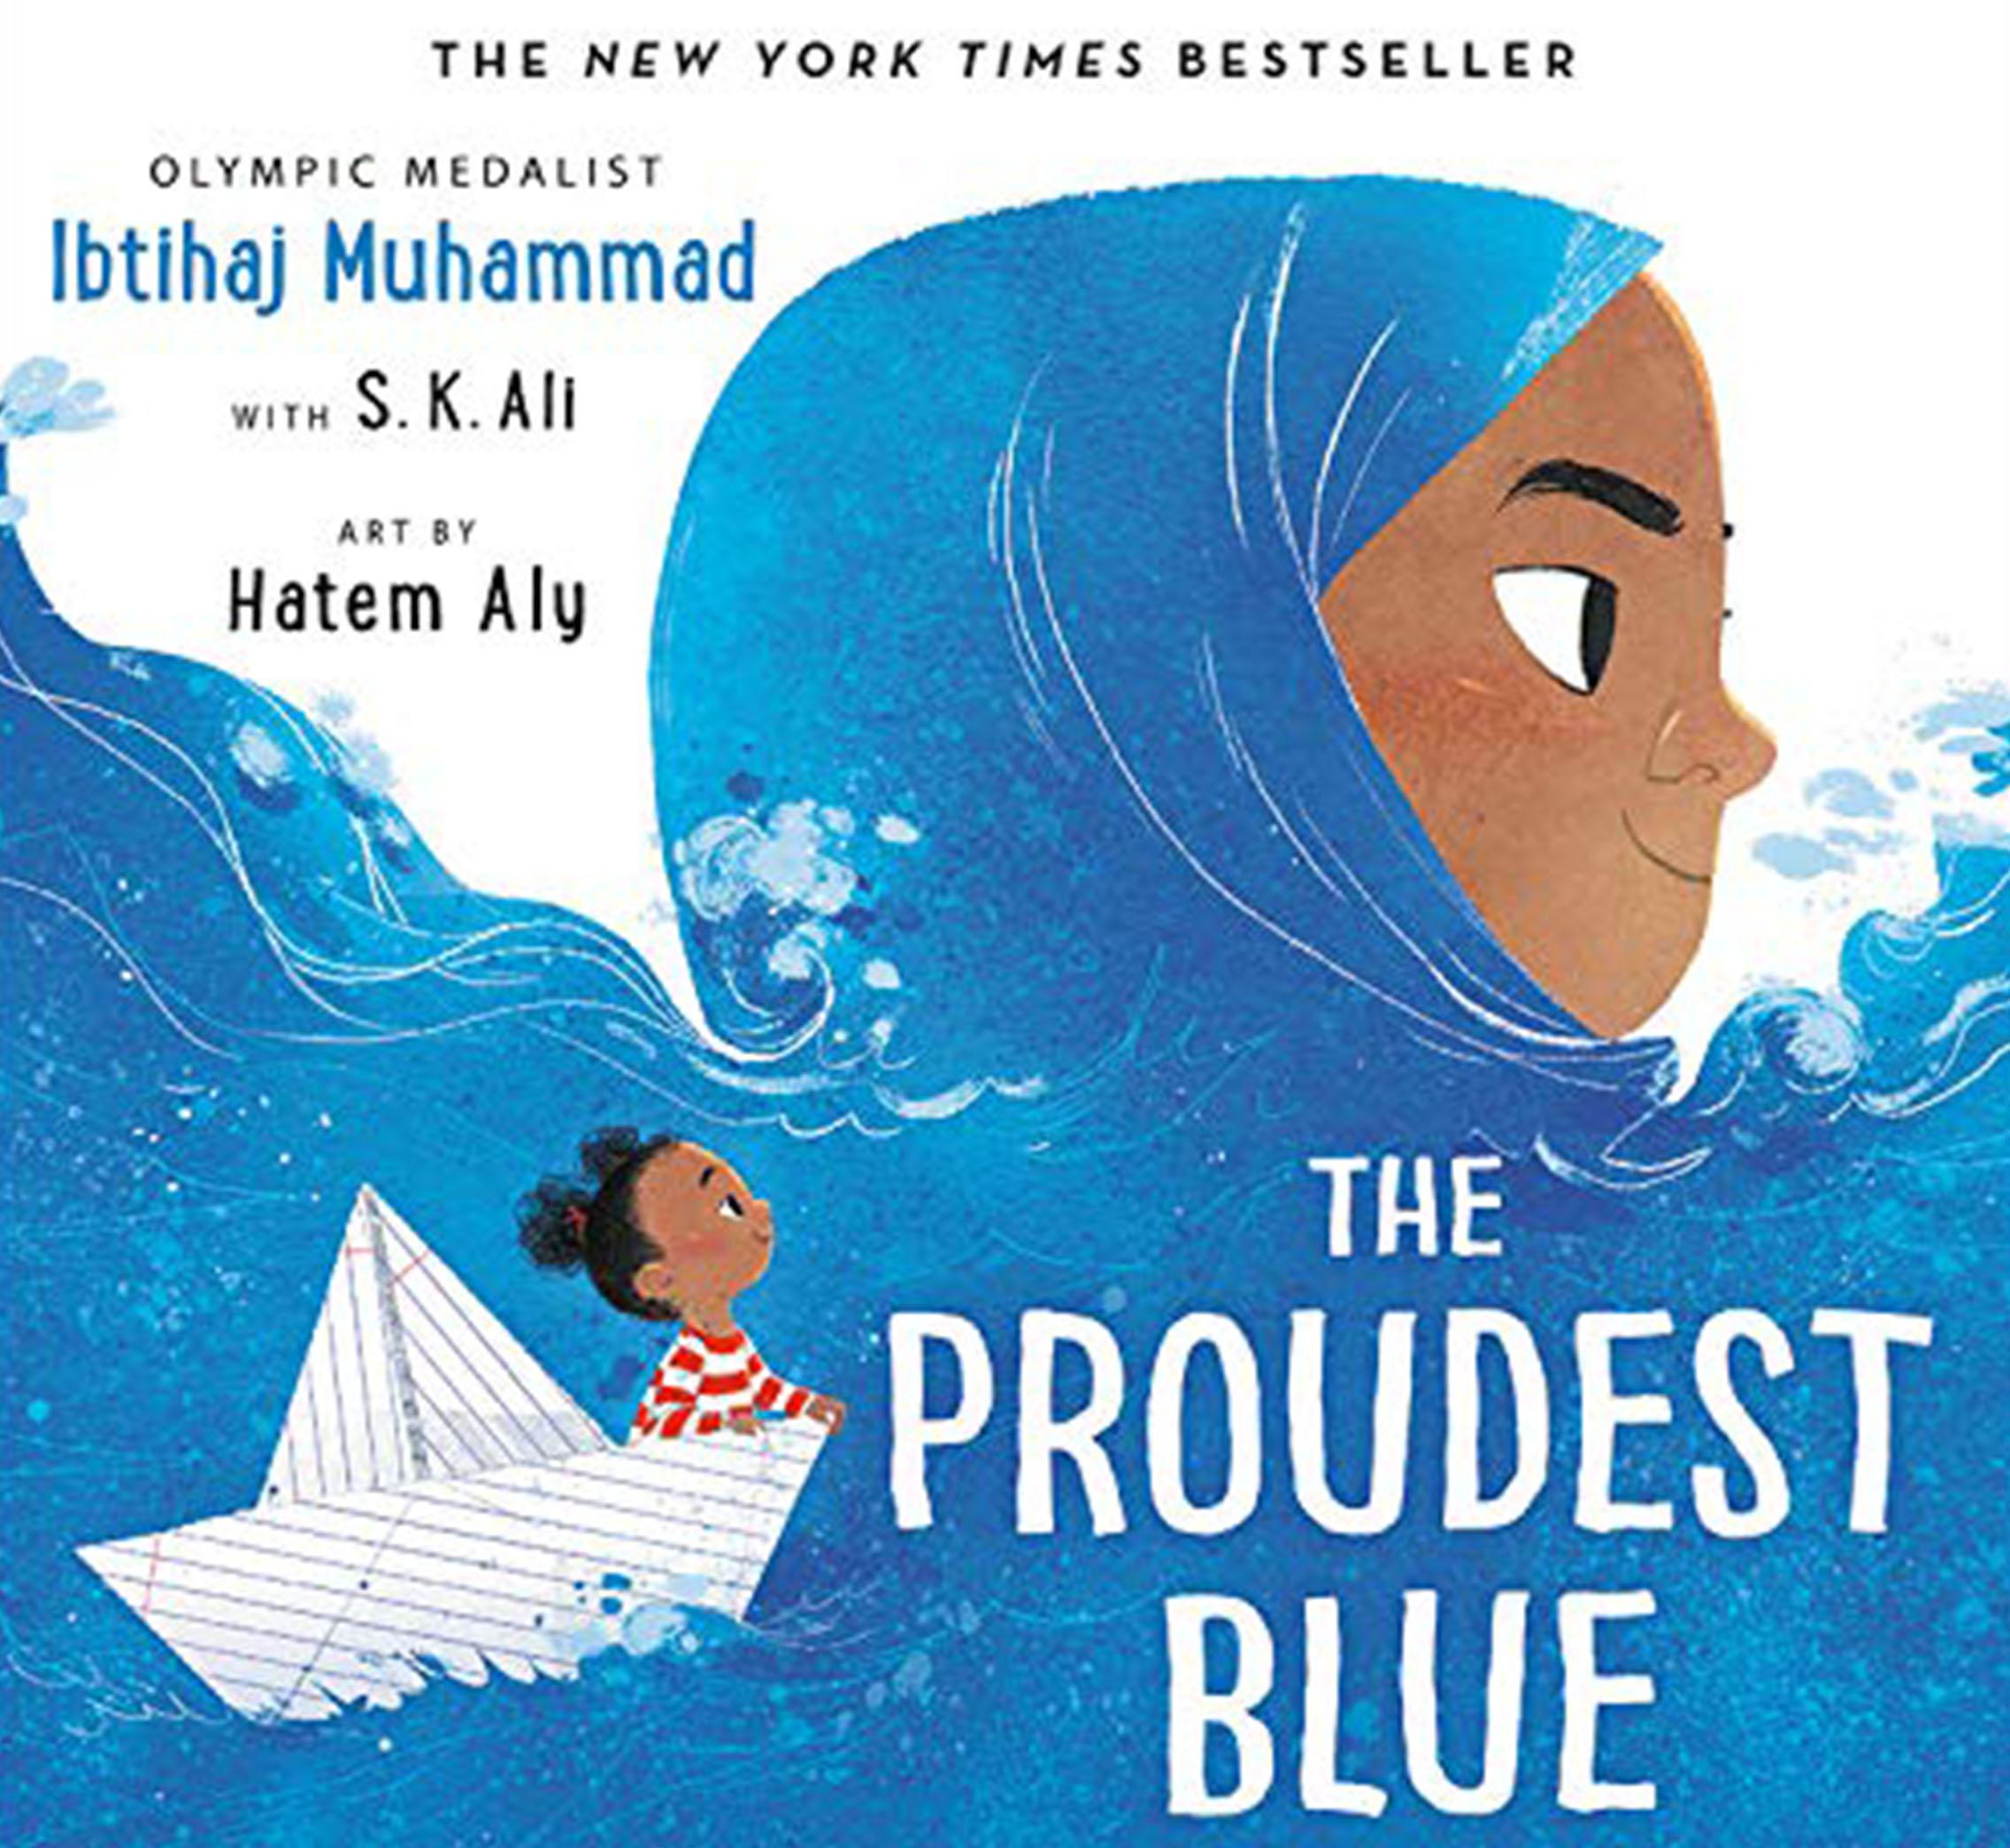 Proudest Blue by Ibtihaj Muhammad